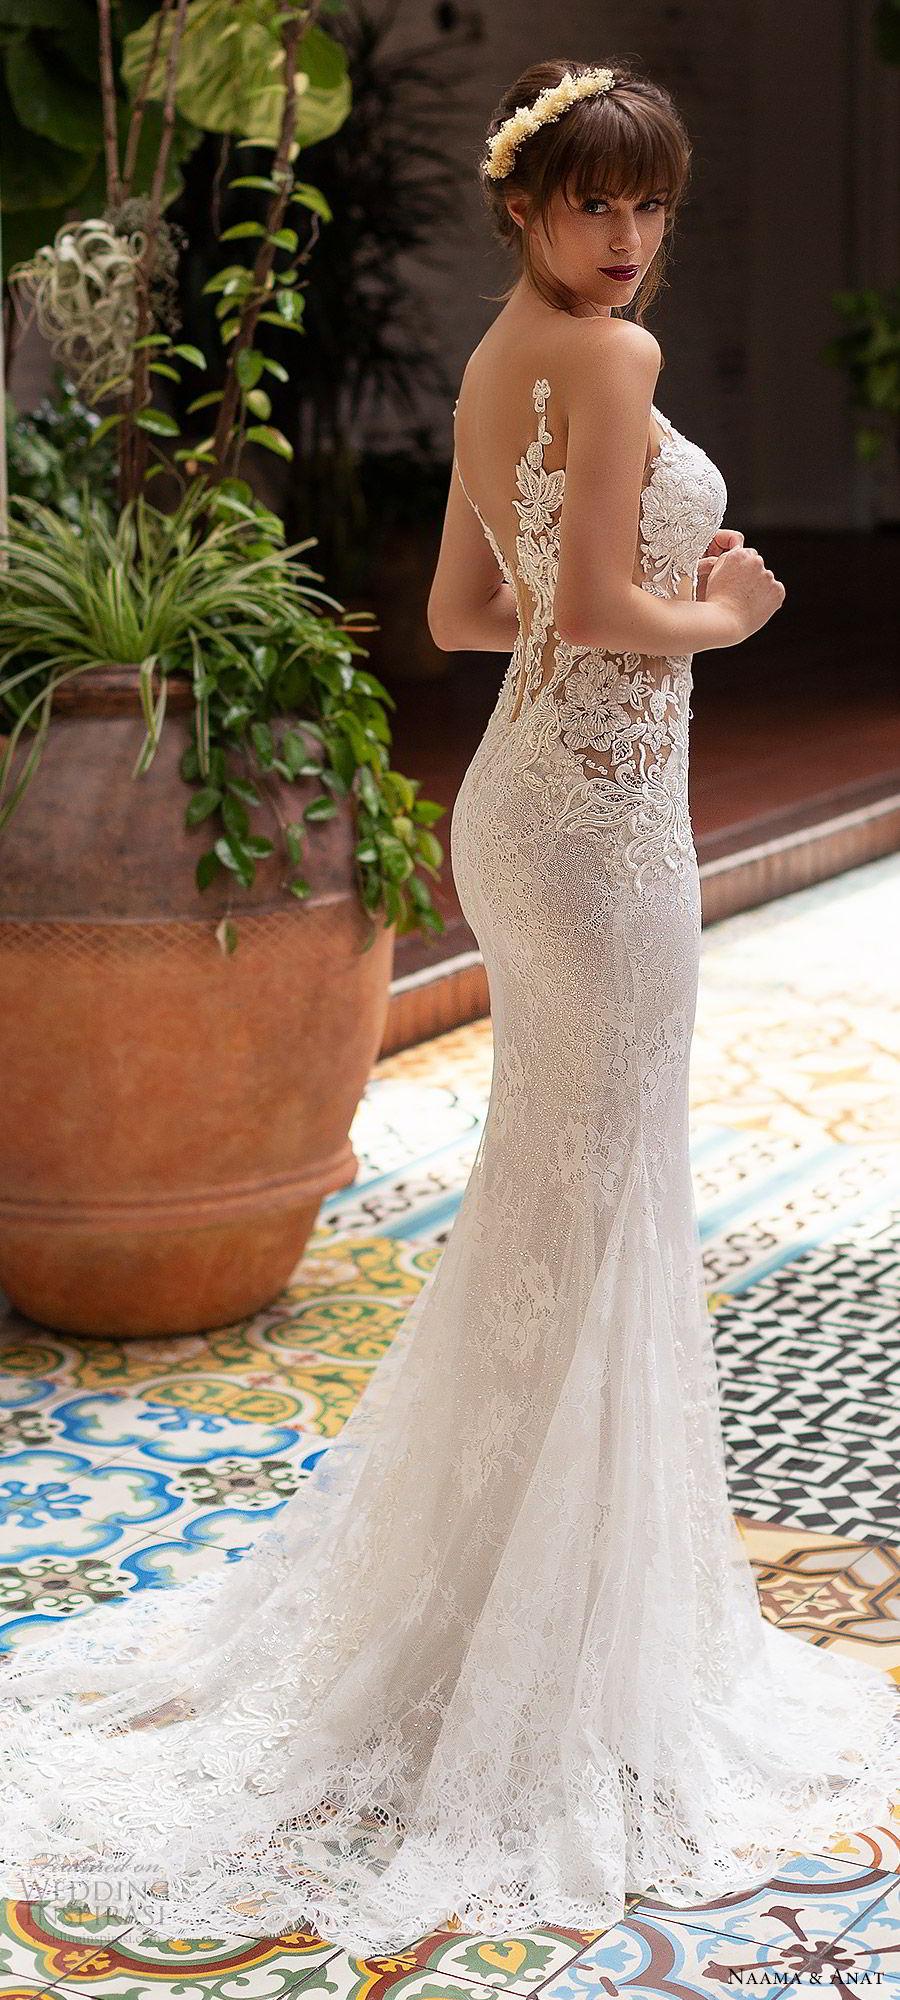 naama anat 2019 bridal sleeveless deep plunging sweetheart neckline sheath fit flare lace wedding dress low back chapel train sexy elegant (3) zbv